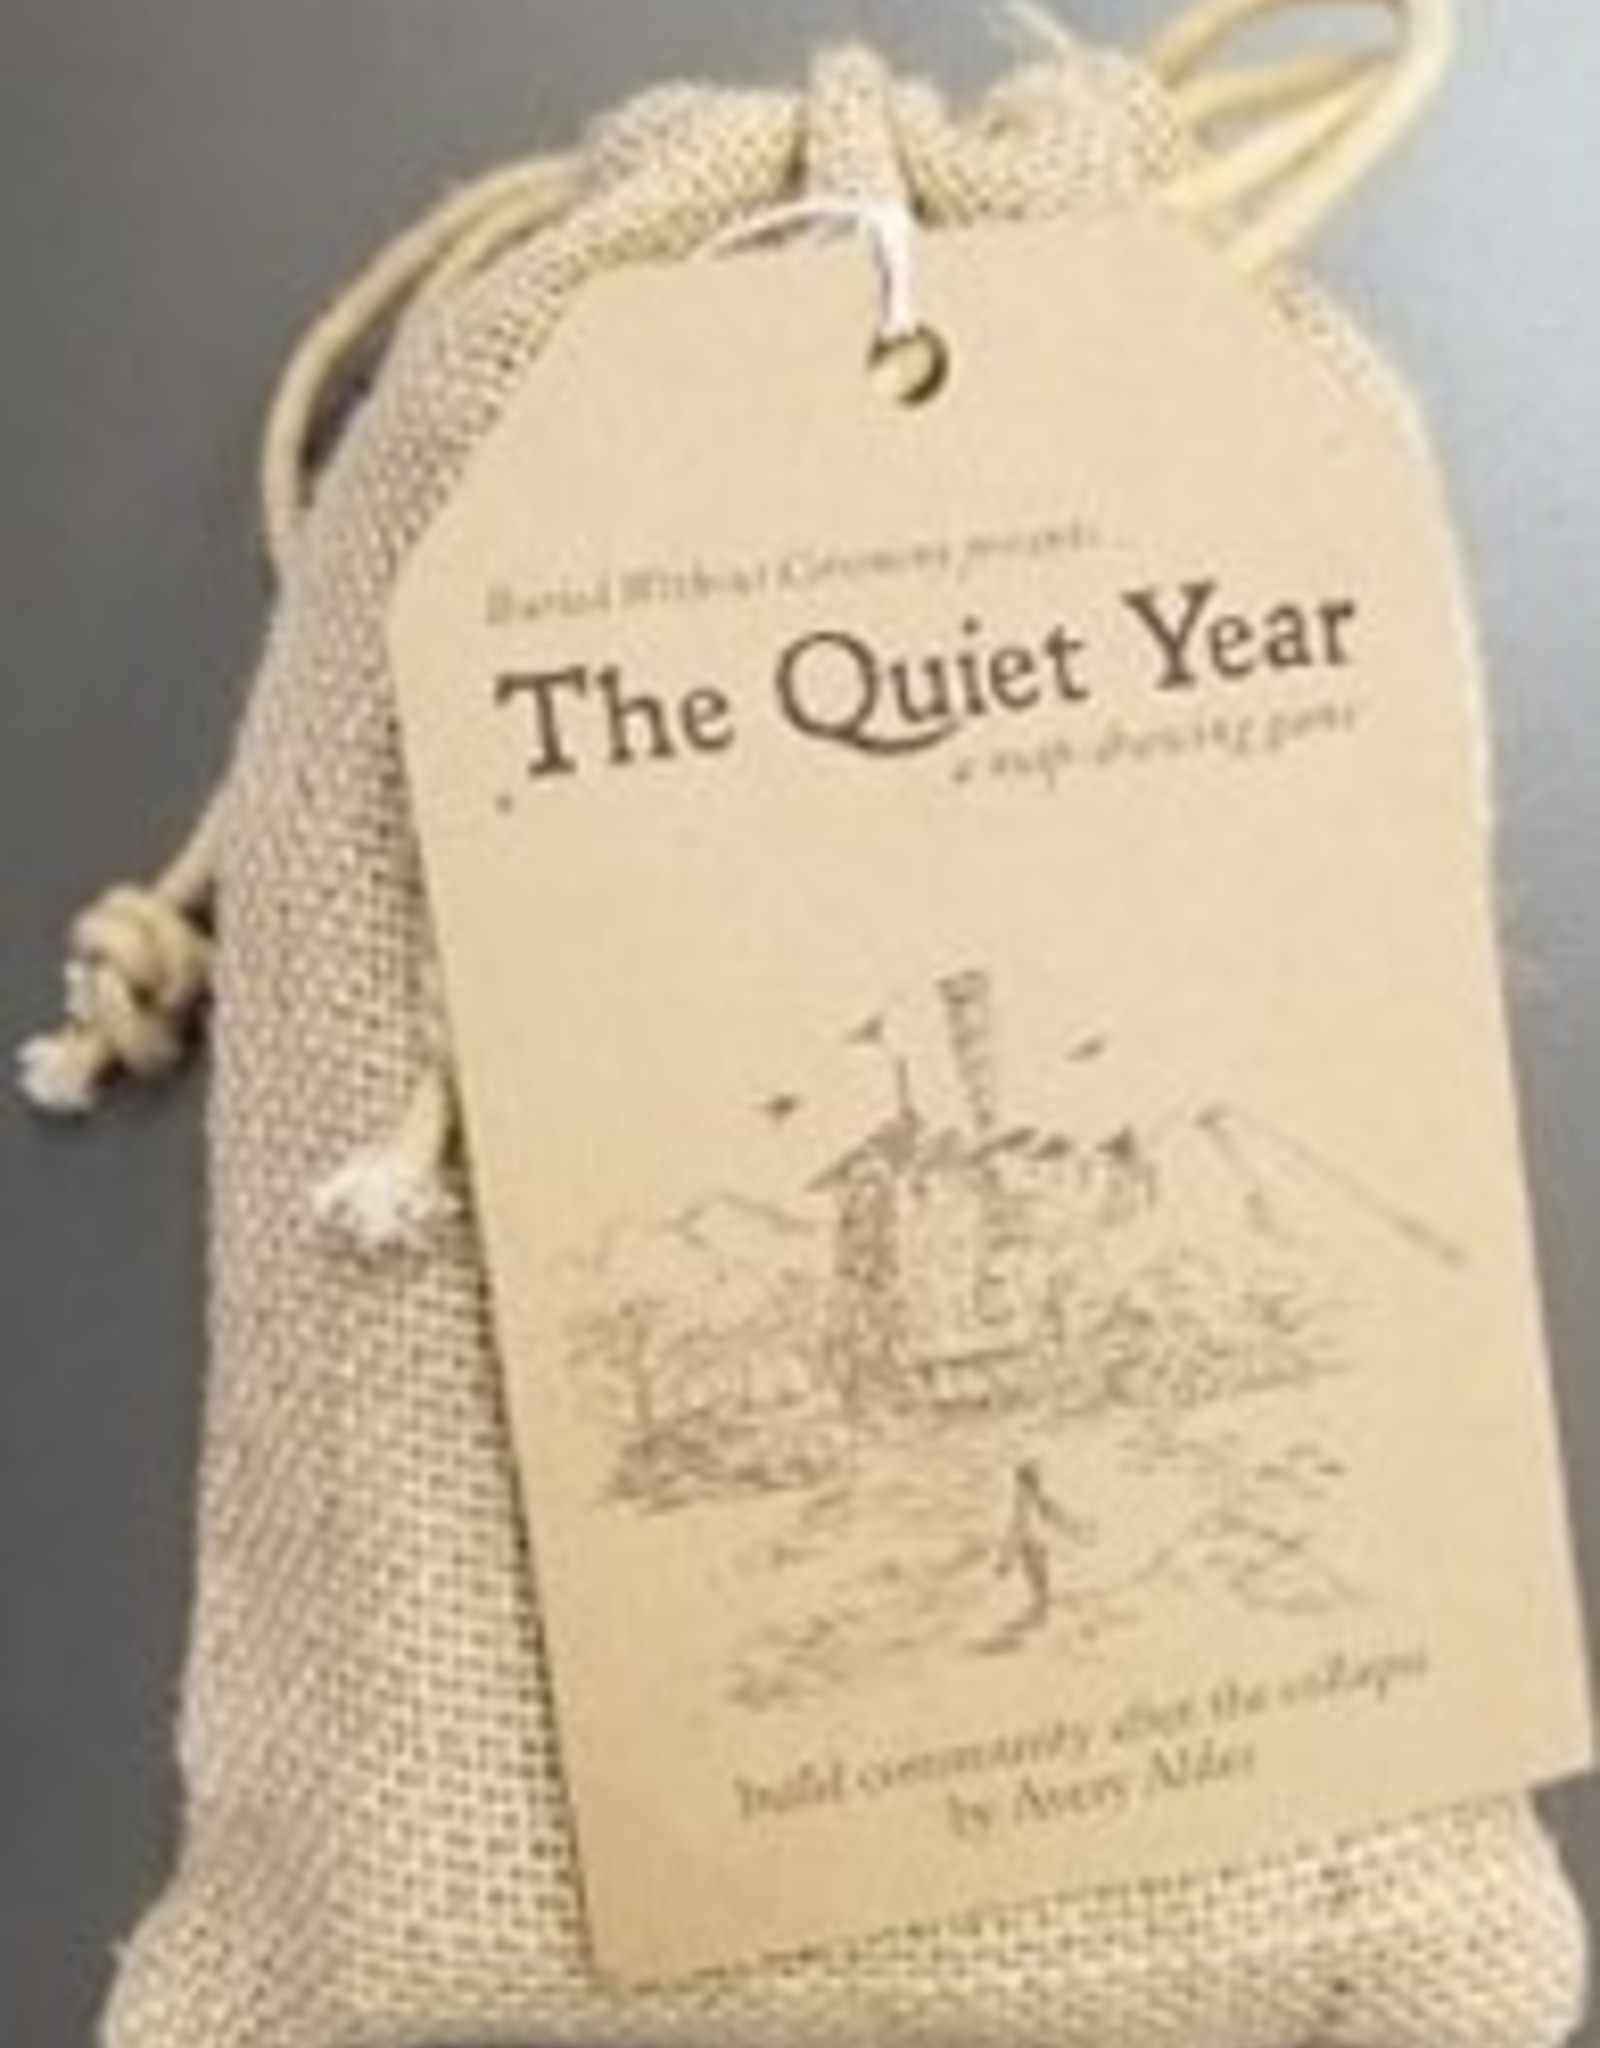 THE QUIET YEAR (DRAWSTRING BAG)